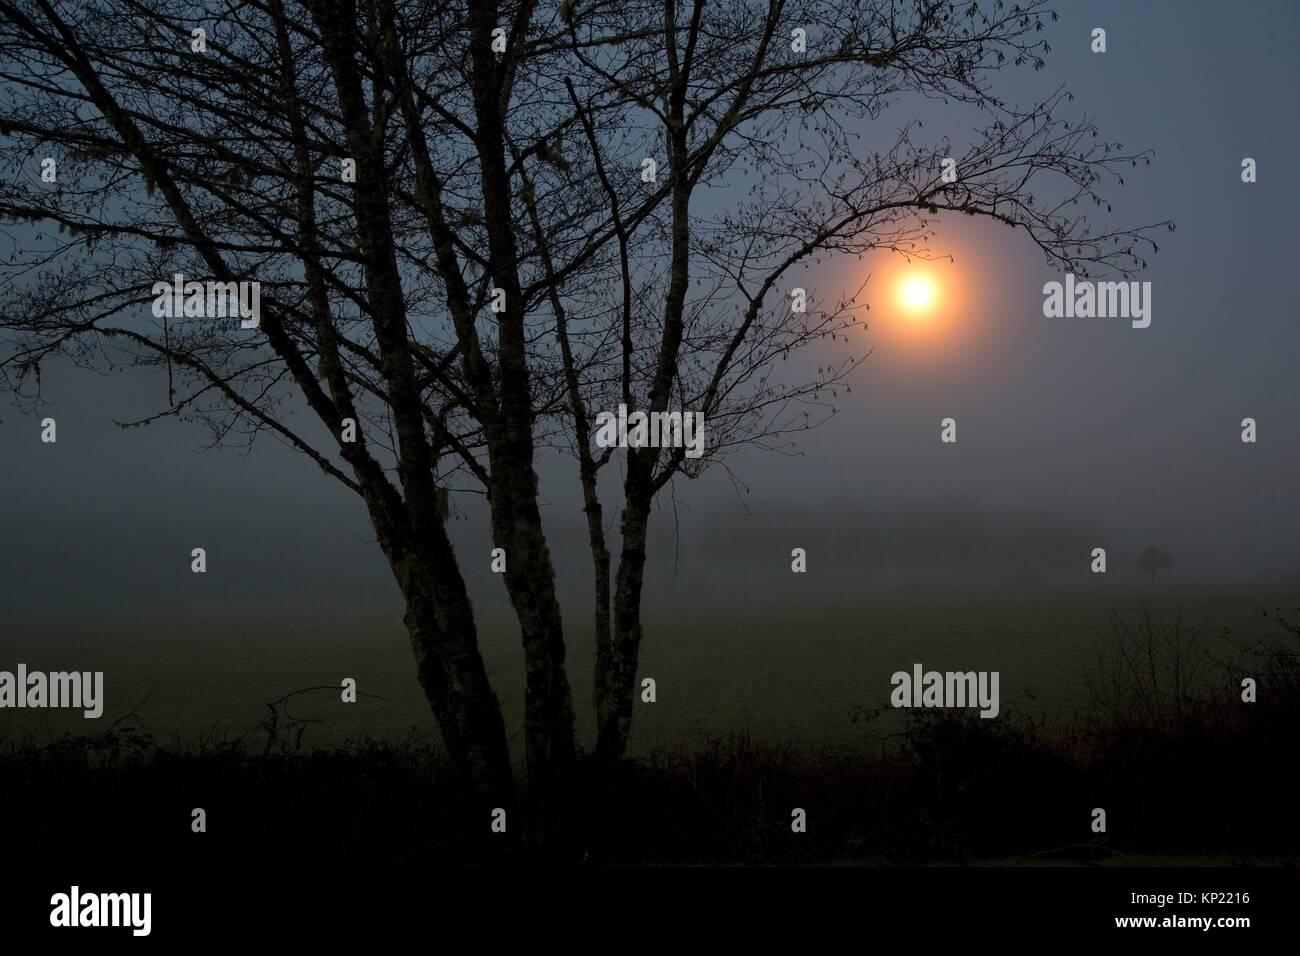 Moonrise with tree silhouette, Jewell Meadows Wildlife Area, Oregon. - Stock Image